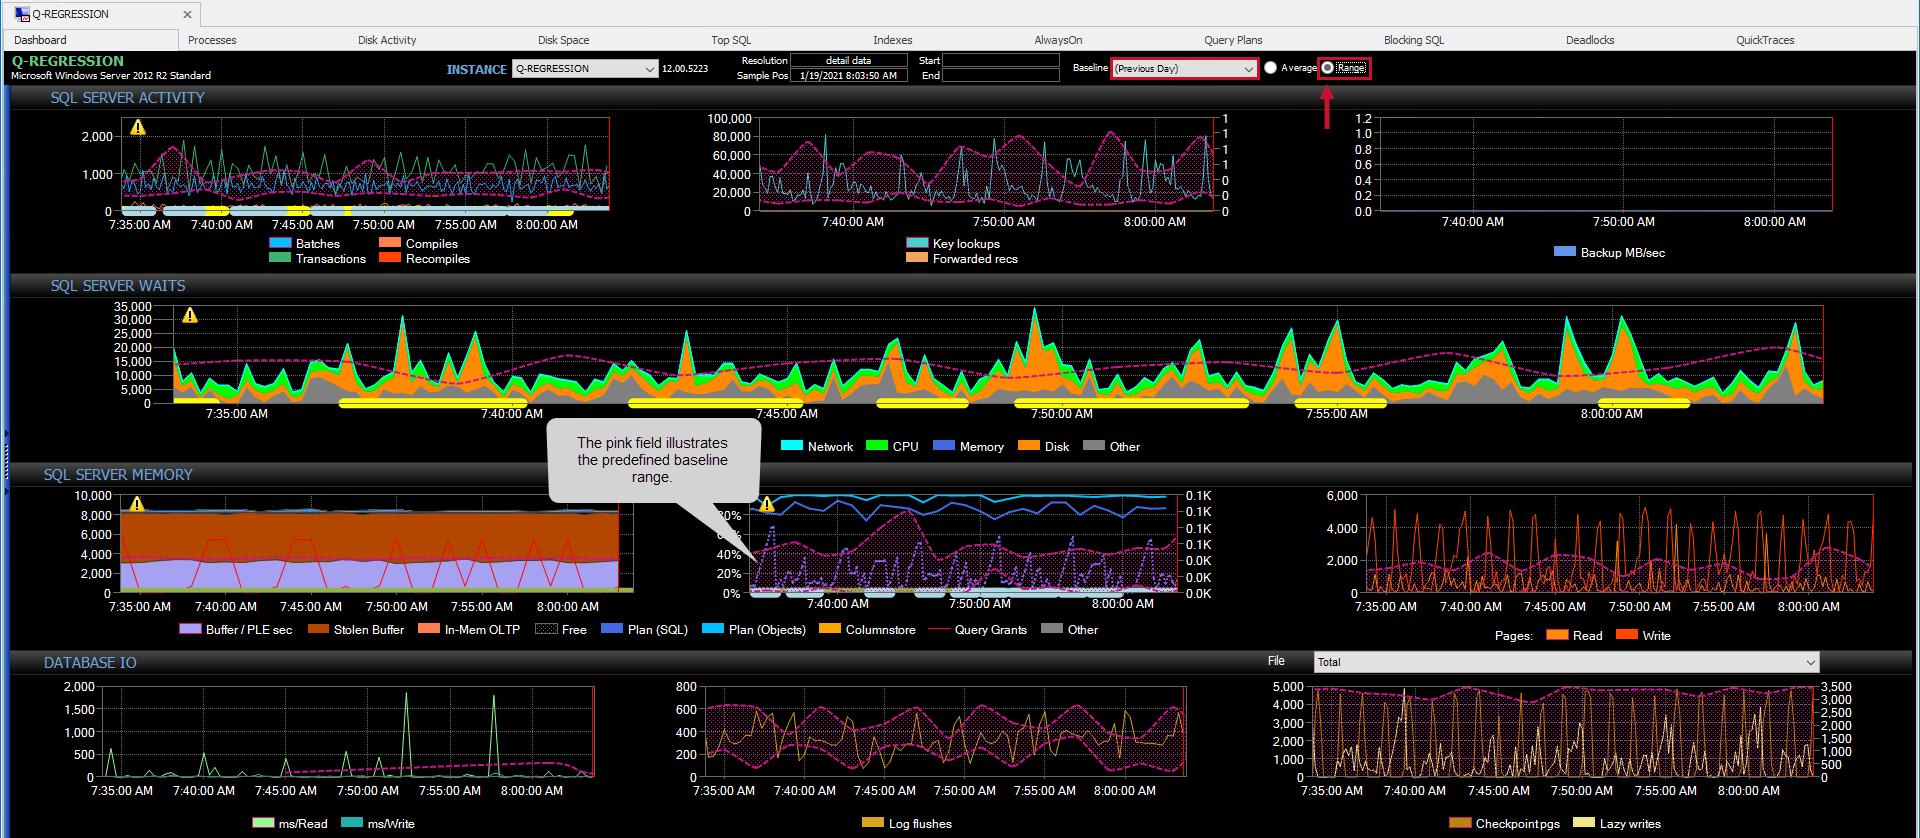 sentryone-performance-analysis-dashboard-baseline-range-example